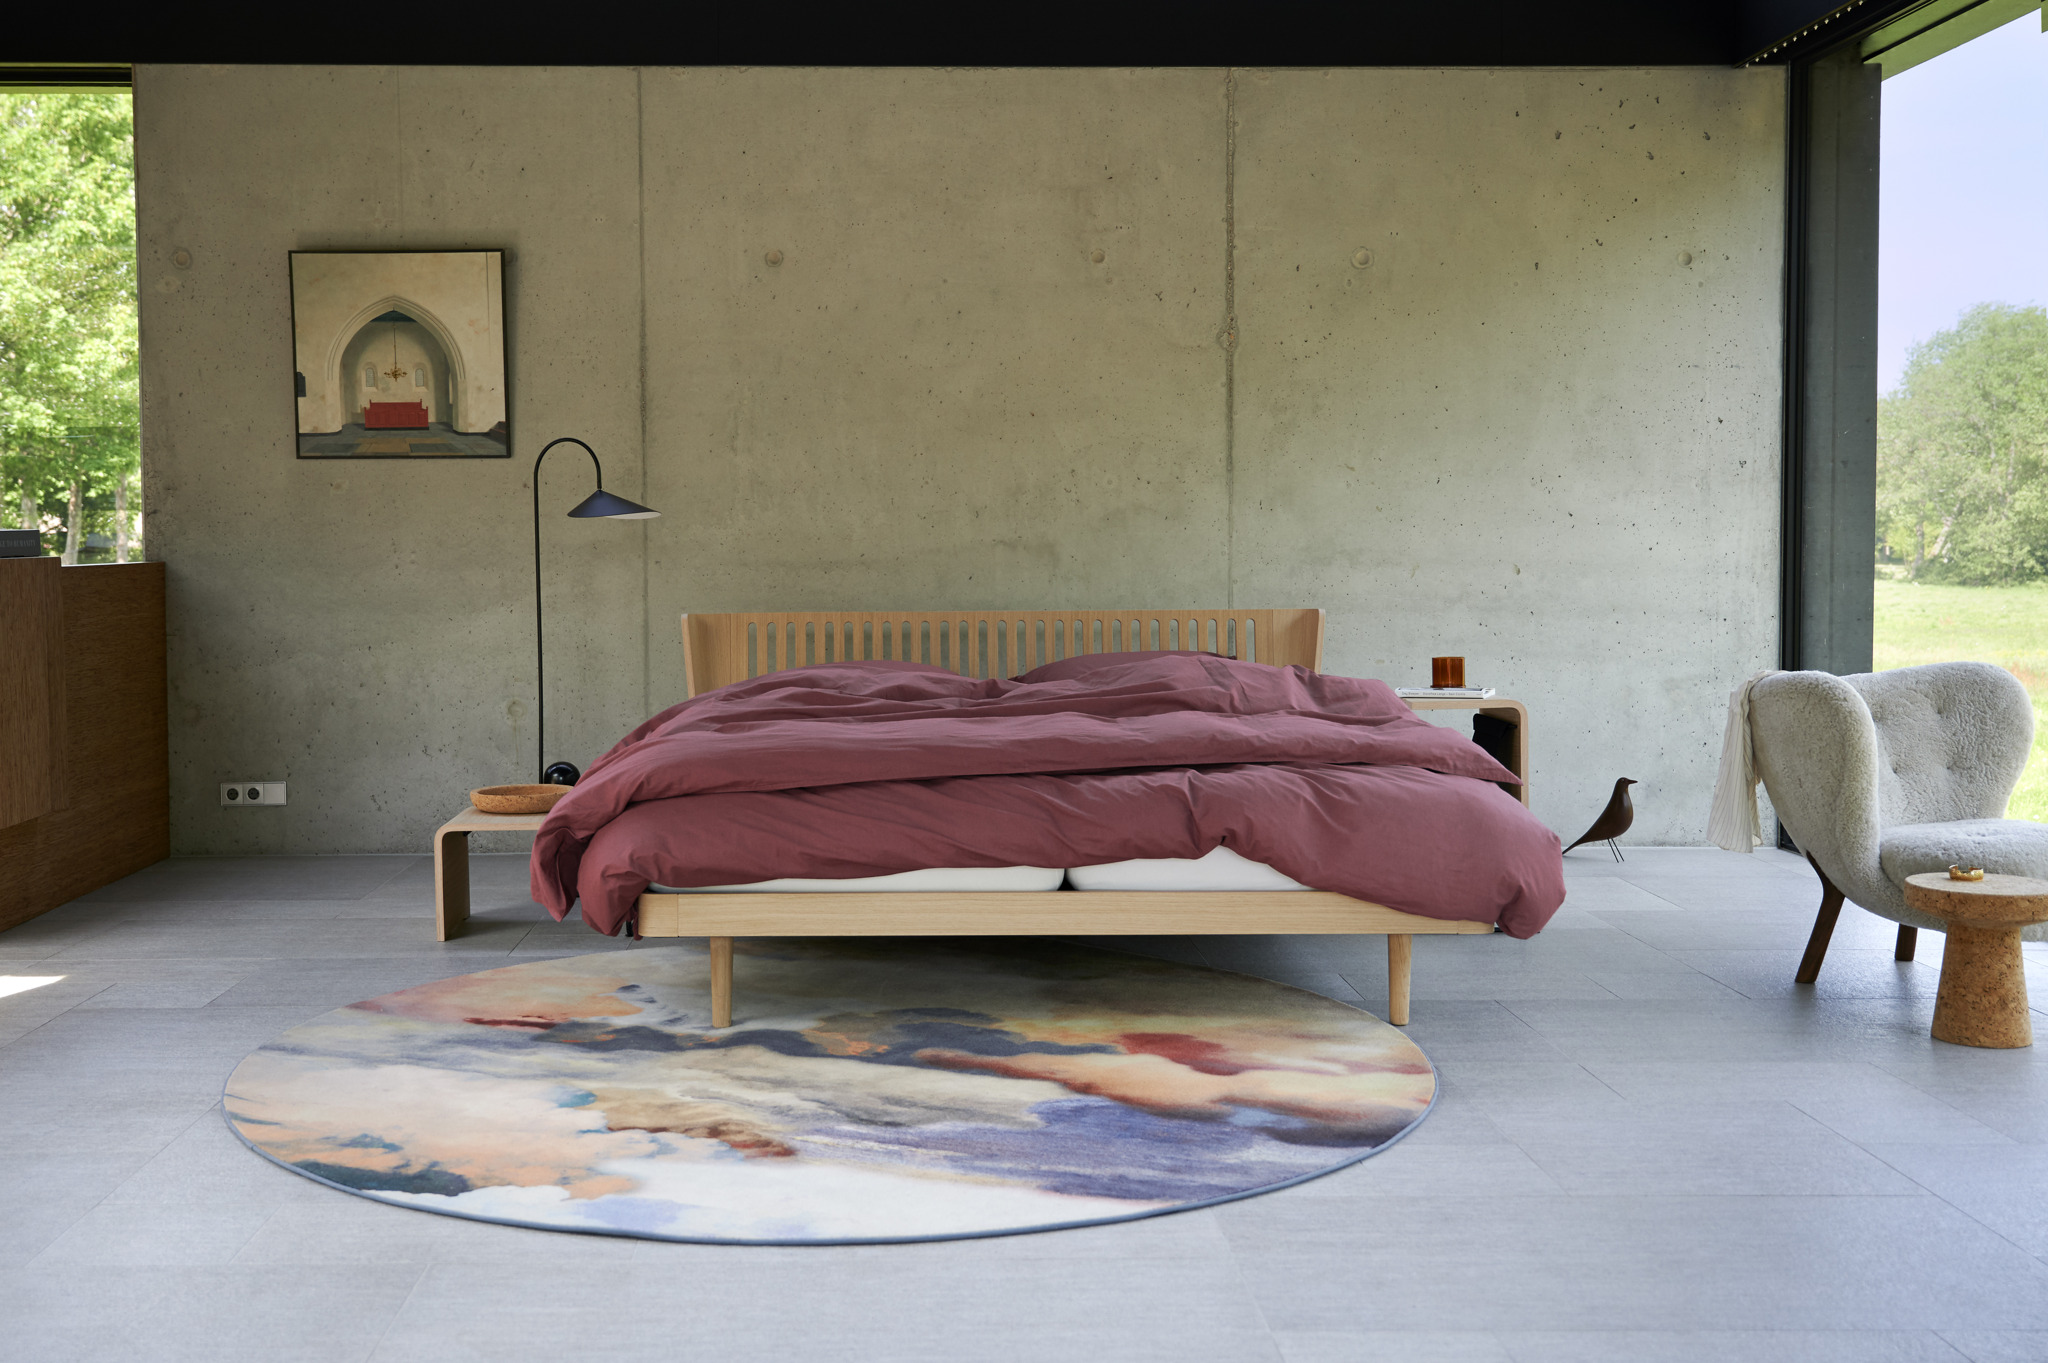 Auping Noa Scandinavisch Design Door Architecte Eva Harlou